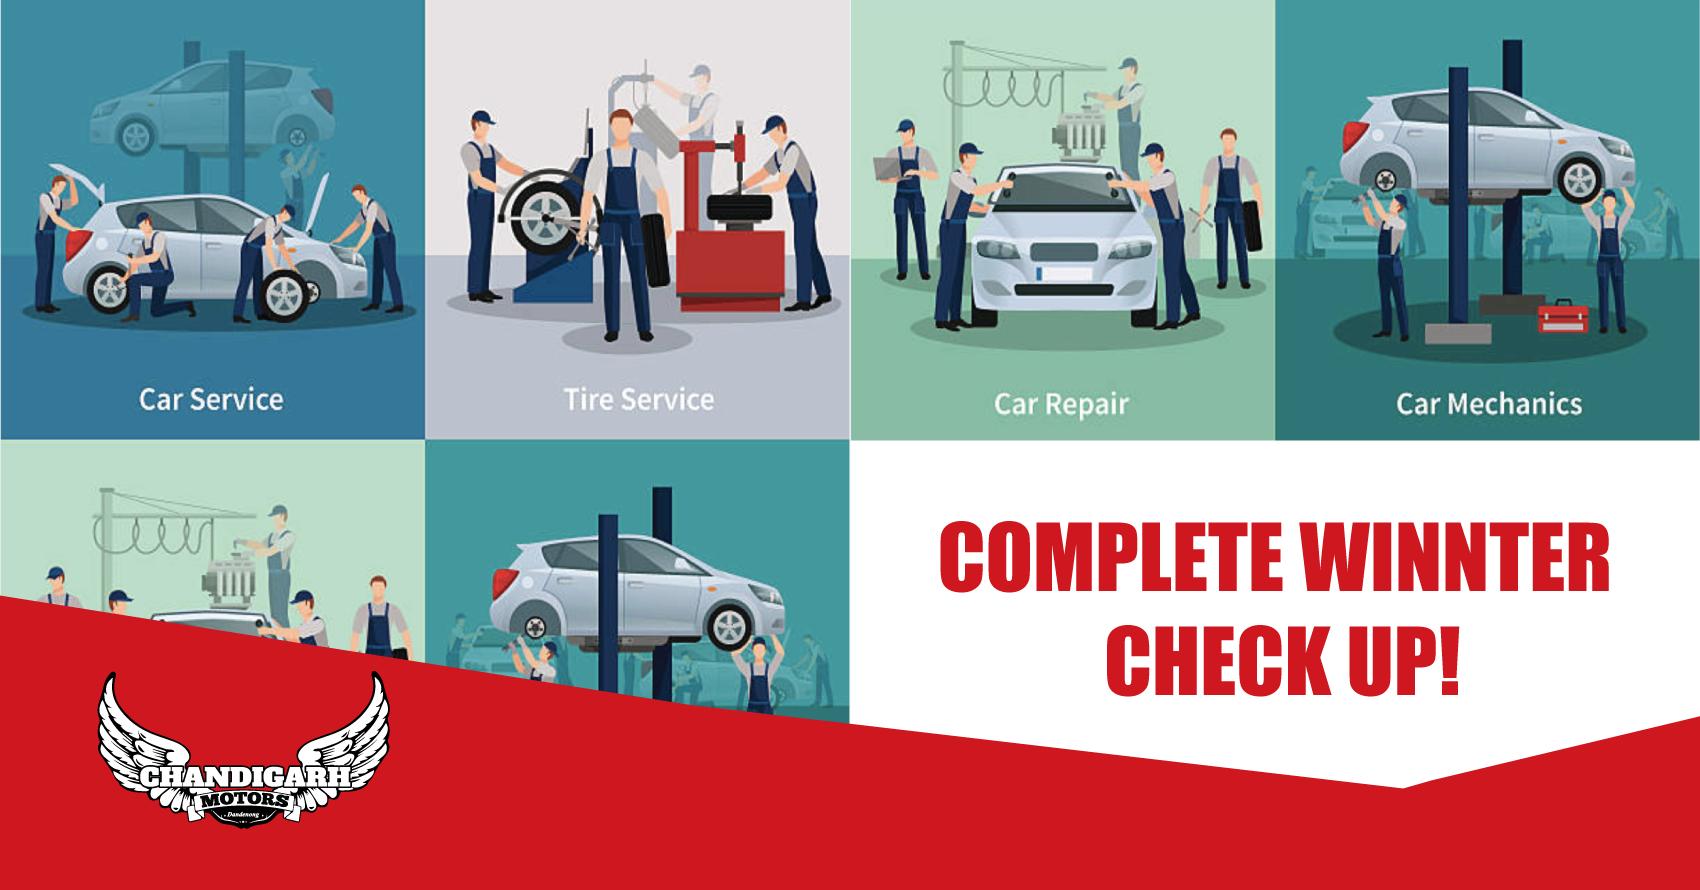 Car Mechanic In Narre Warren Car Service Repair Narre Warren Car Mechanic Car Repair Service Auto Repair